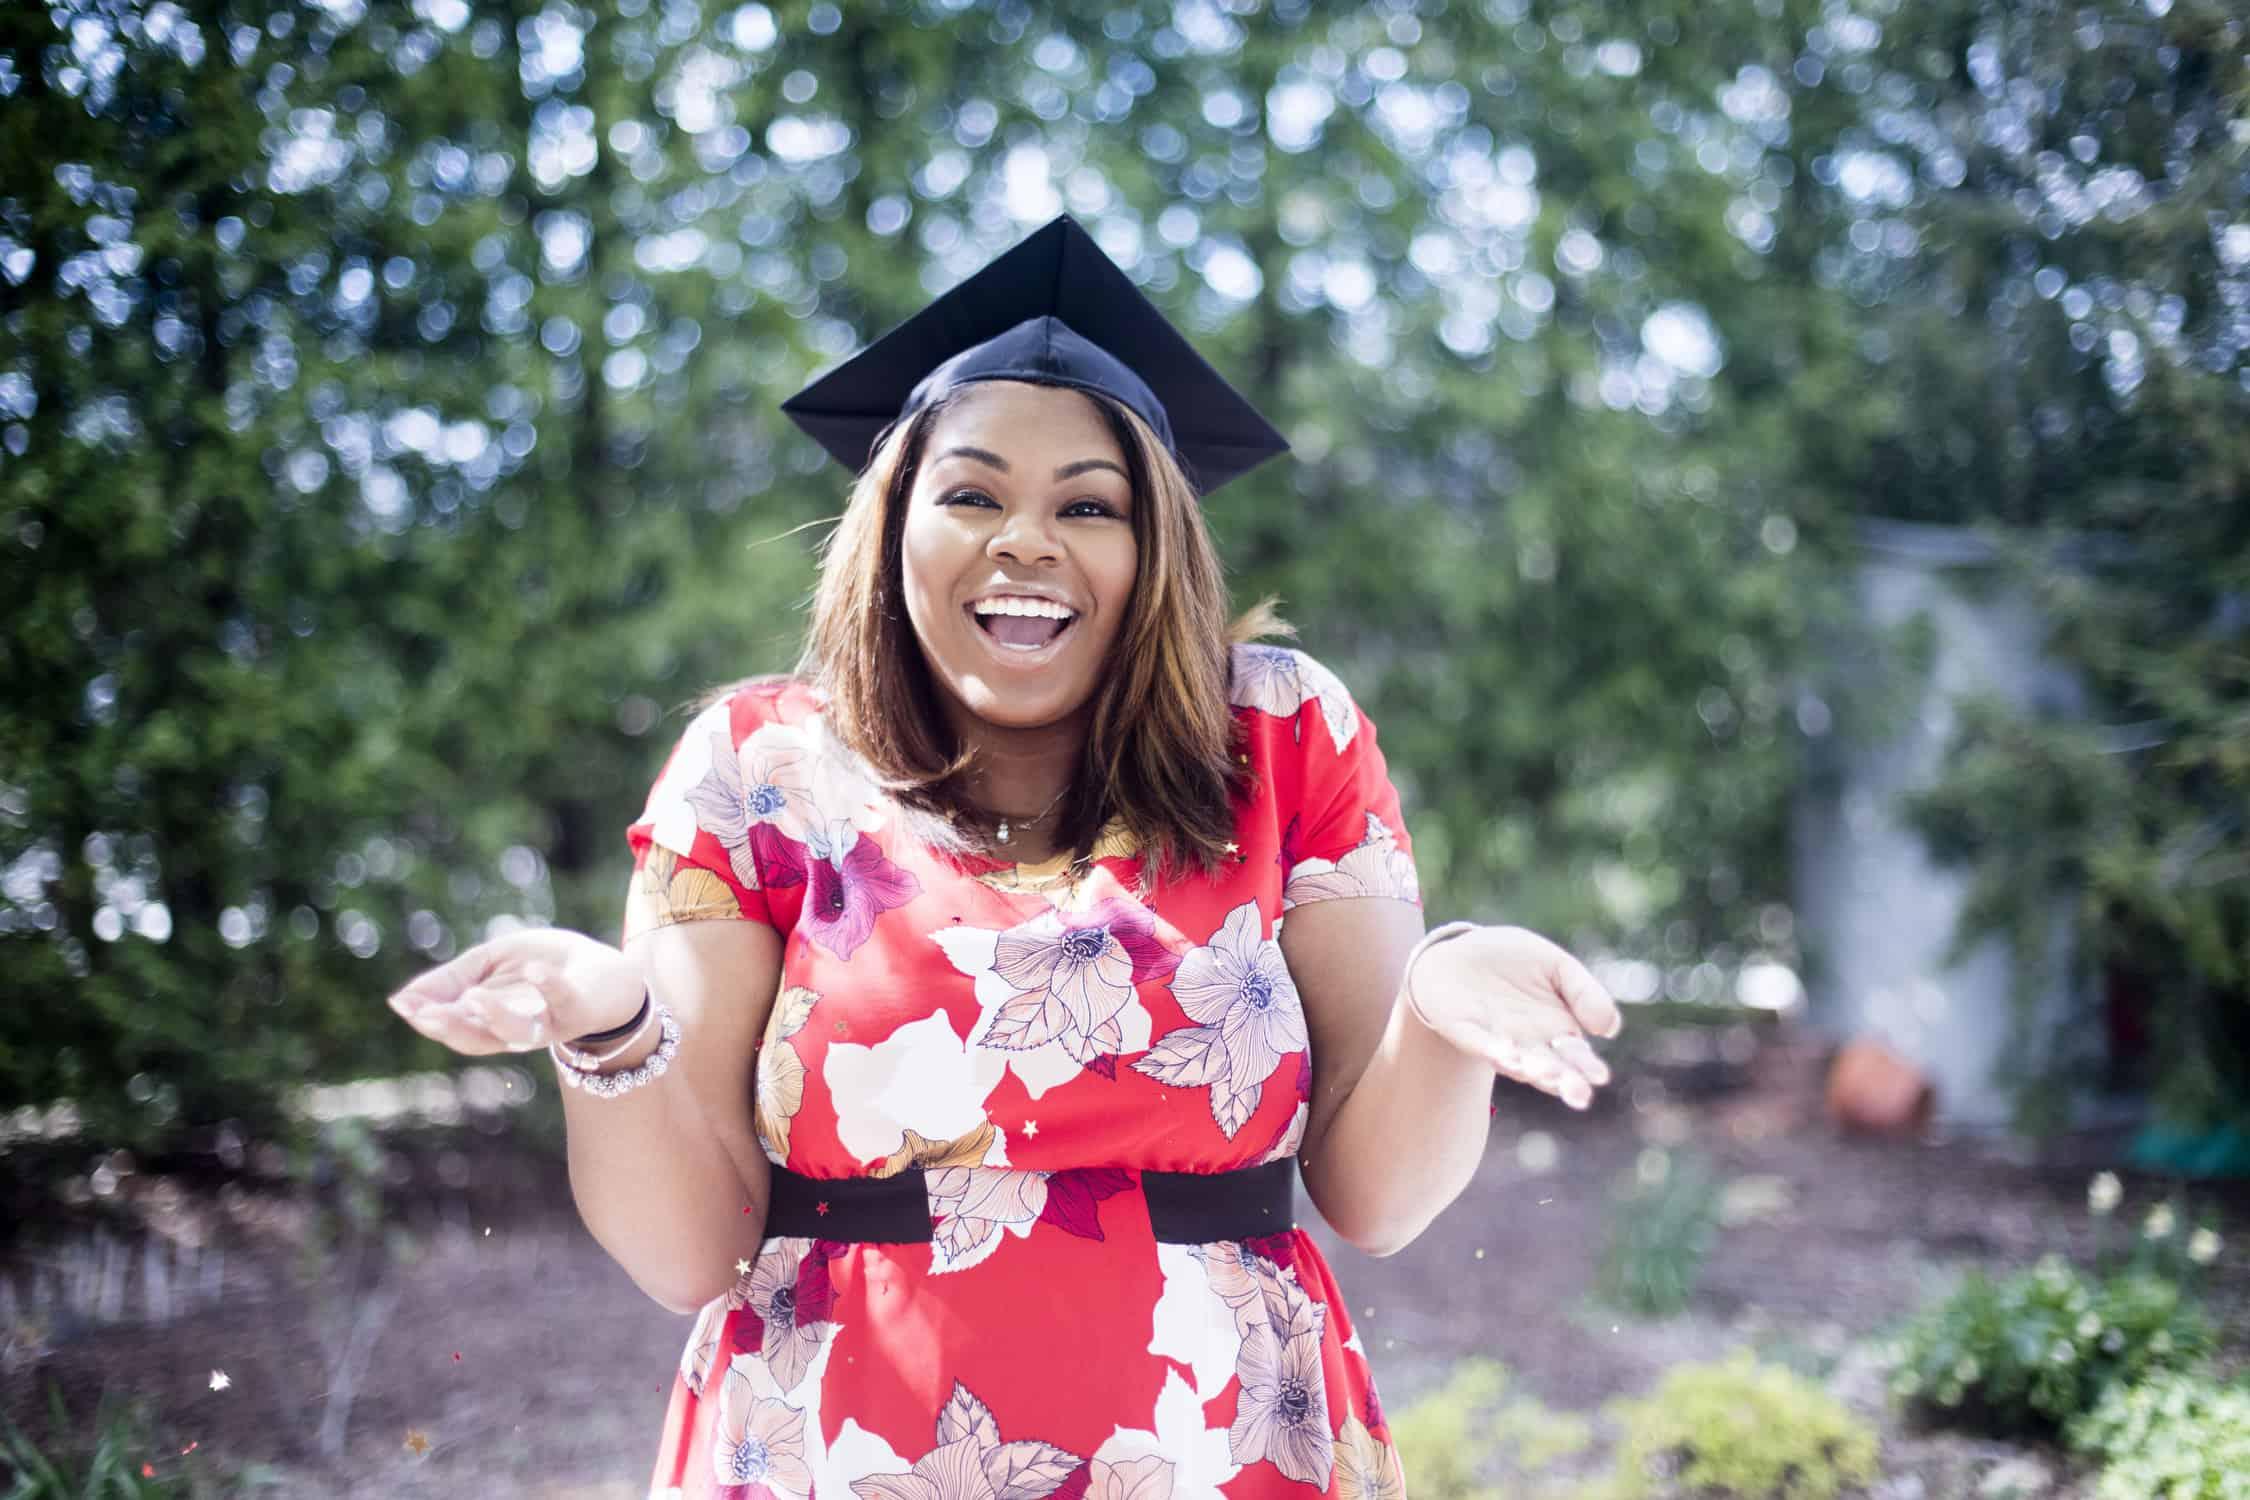 woman smiling and shrugging in graduation cap